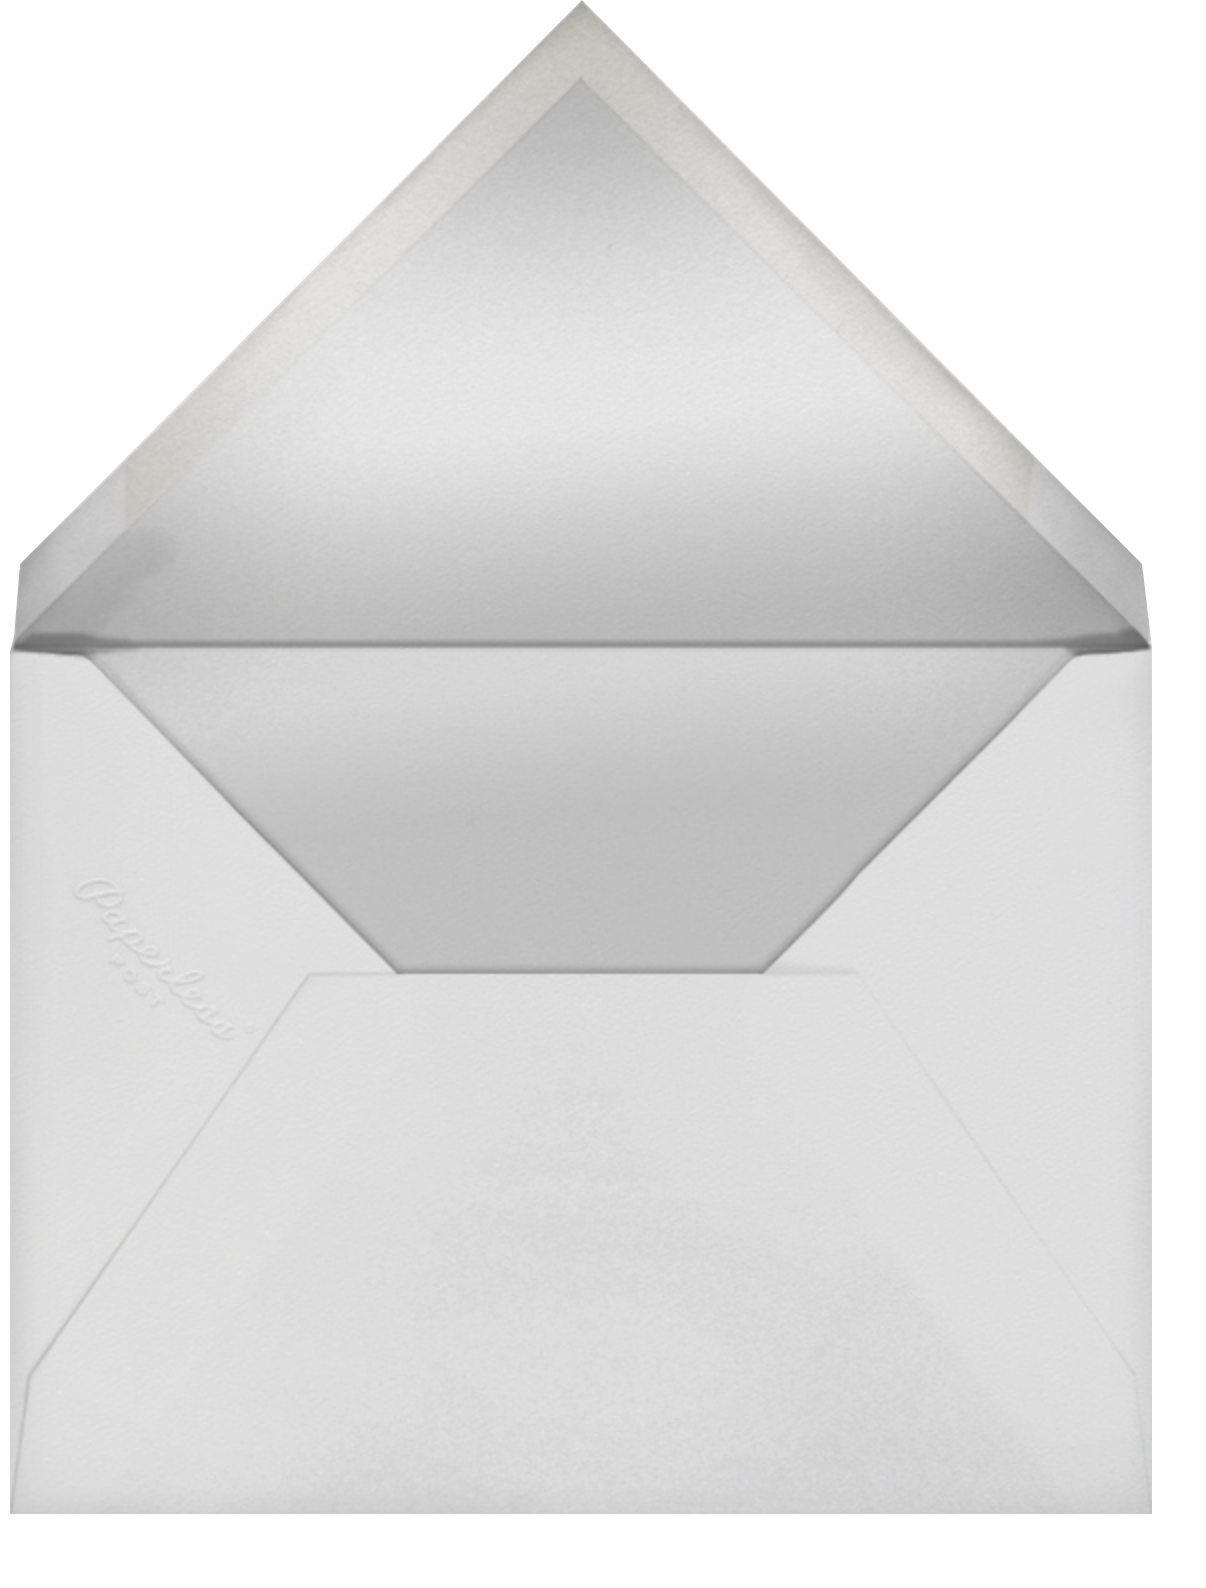 Gramercy Garden (Menu) - Paperless Post - Menus - envelope back